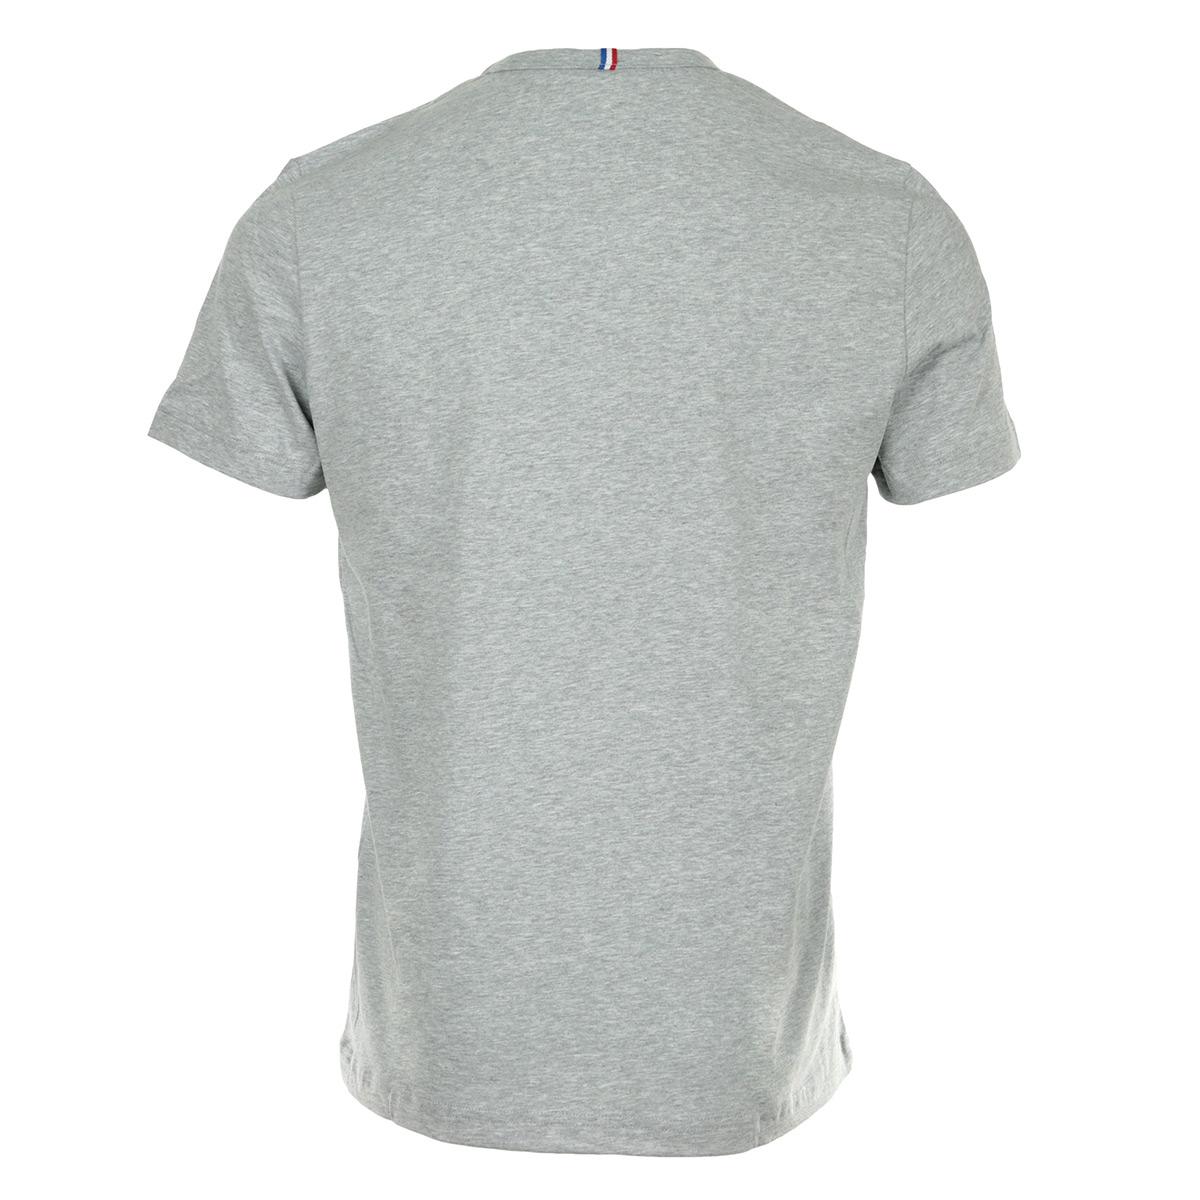 57b43eca9021 Le Coq Sportif ASSE Tee 1821490, T-Shirts homme